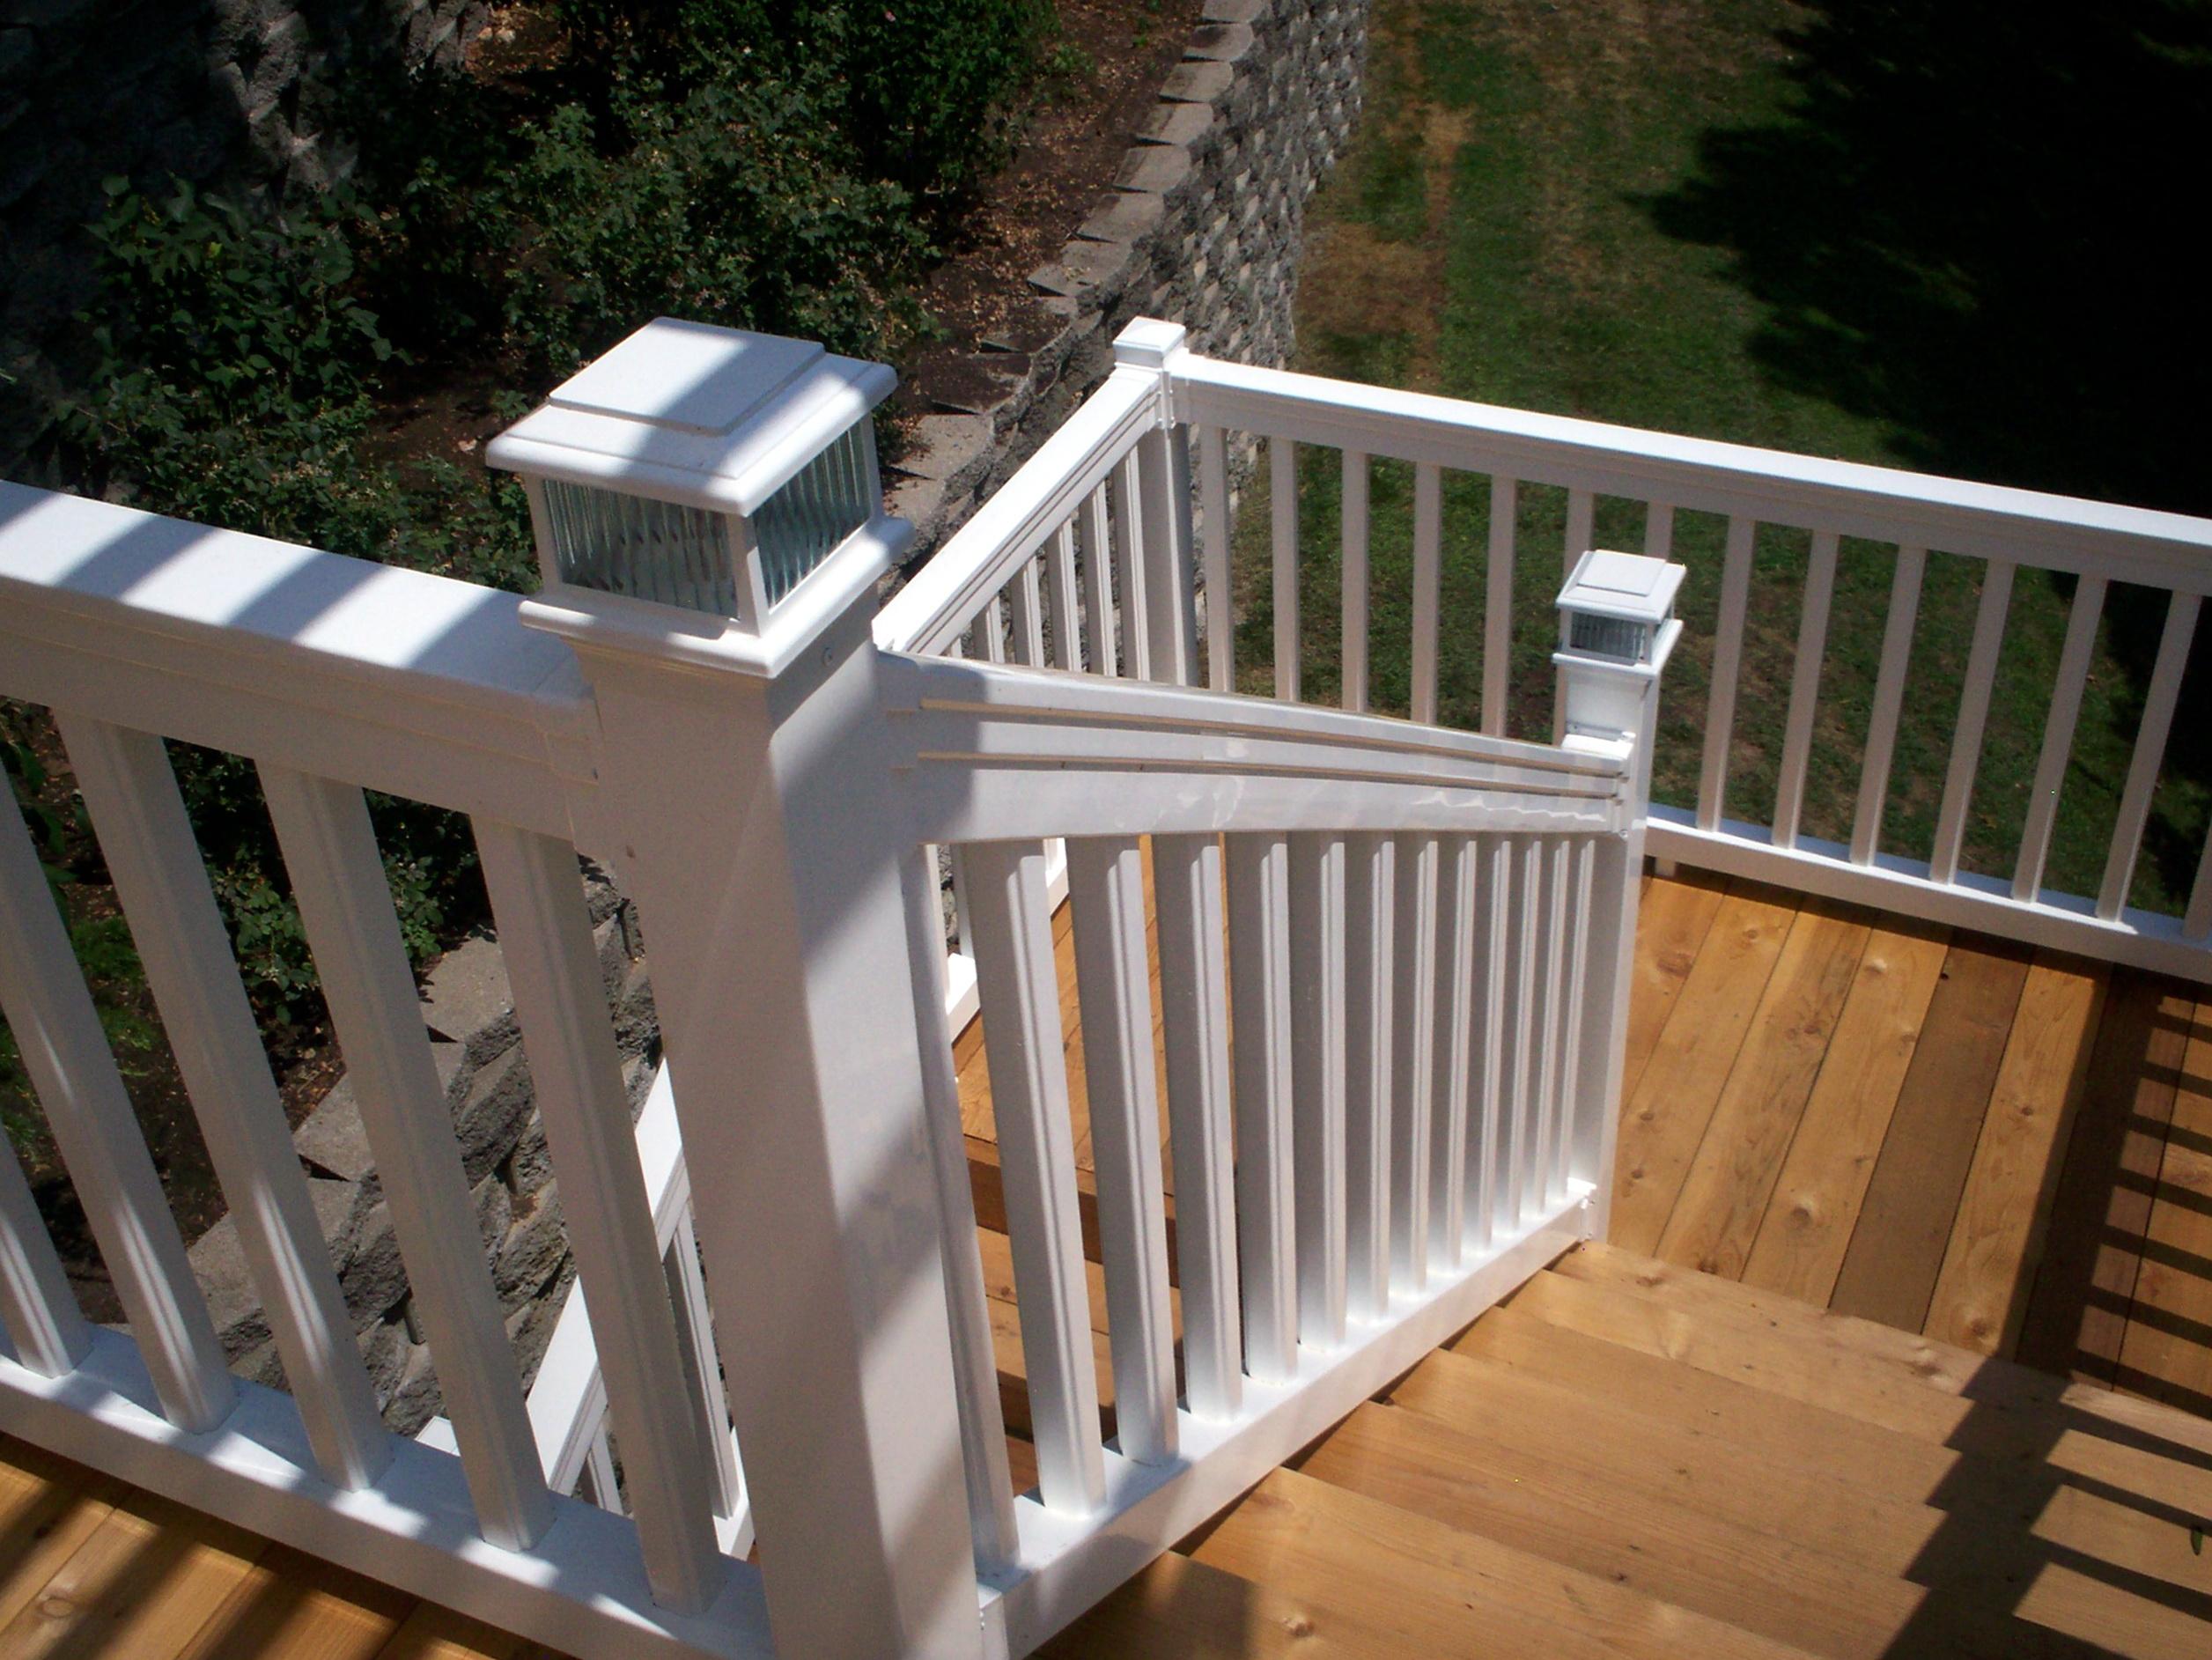 Standard Railing Height Deck Stairs